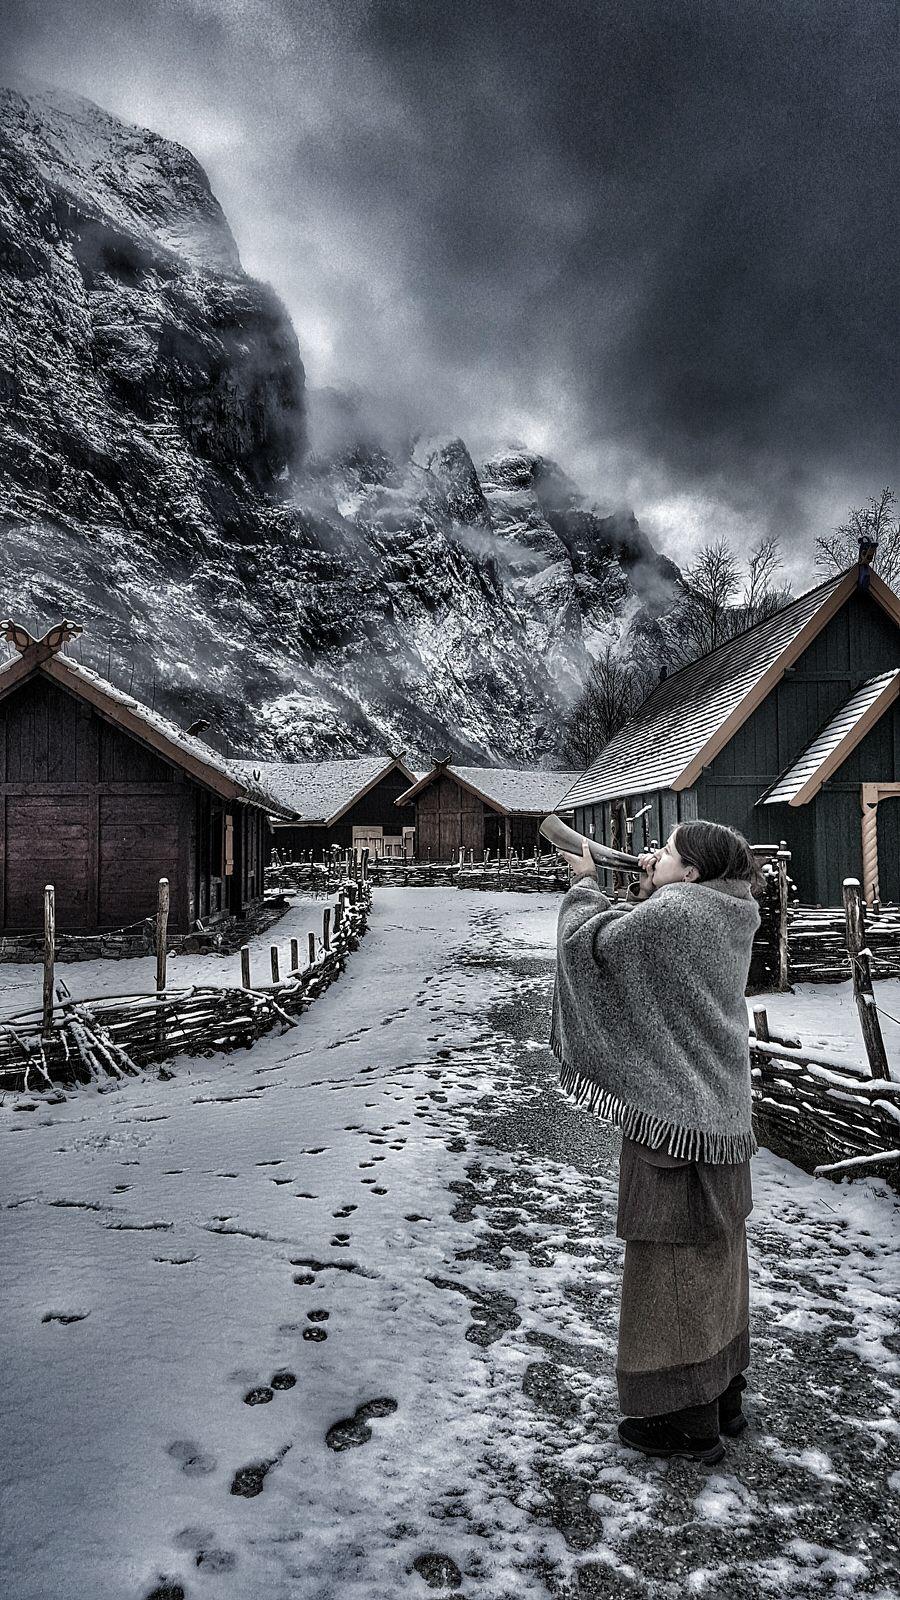 Viking-valley-nikinglandsby.jpeg